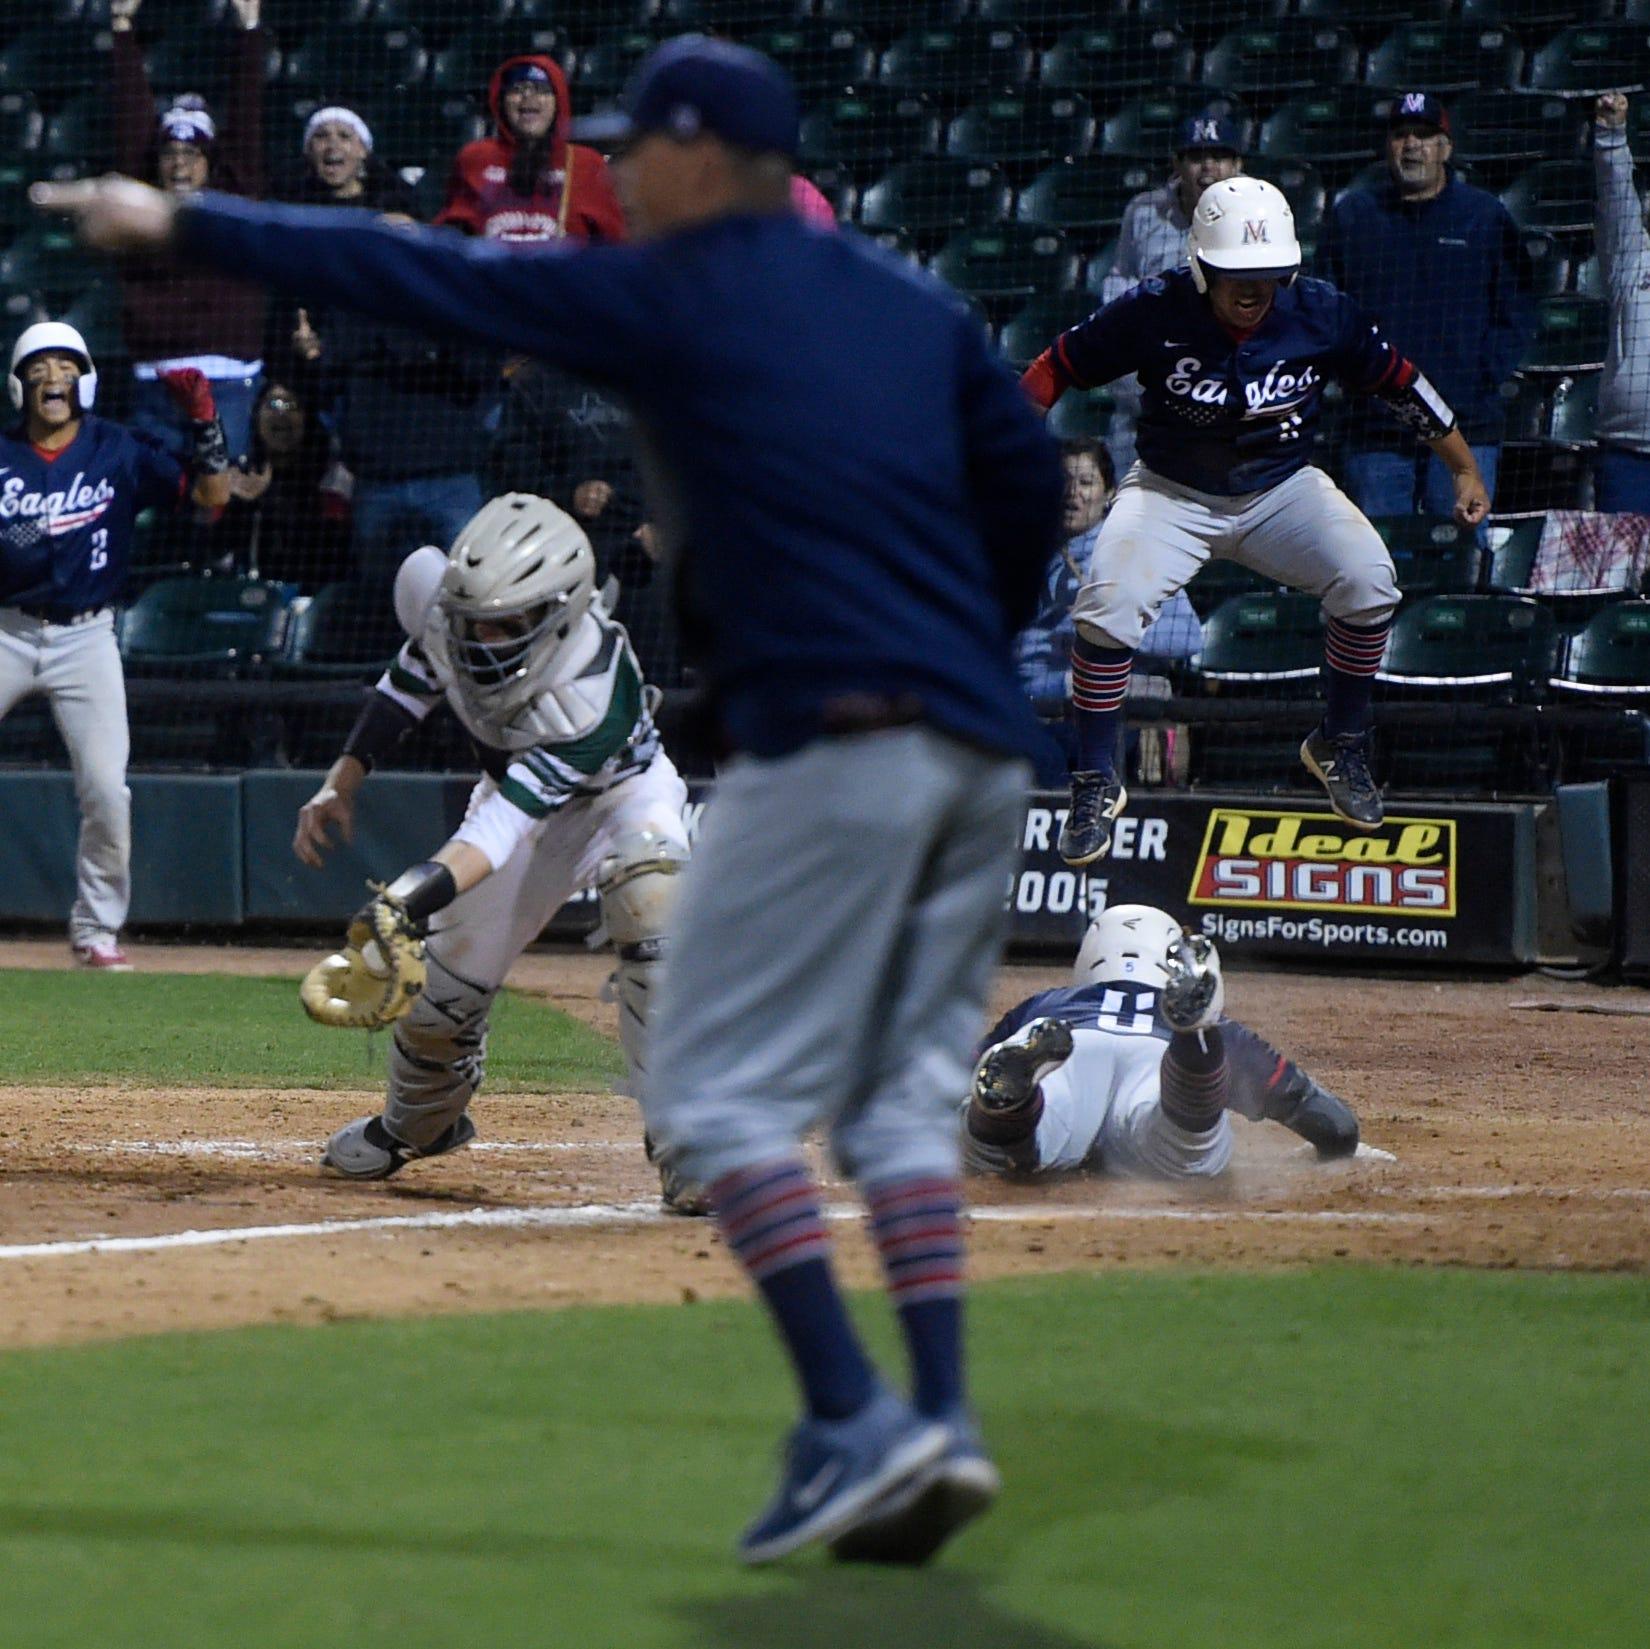 Veterans Memorial tops rival King in 11-inning thriller at Whataburger Field